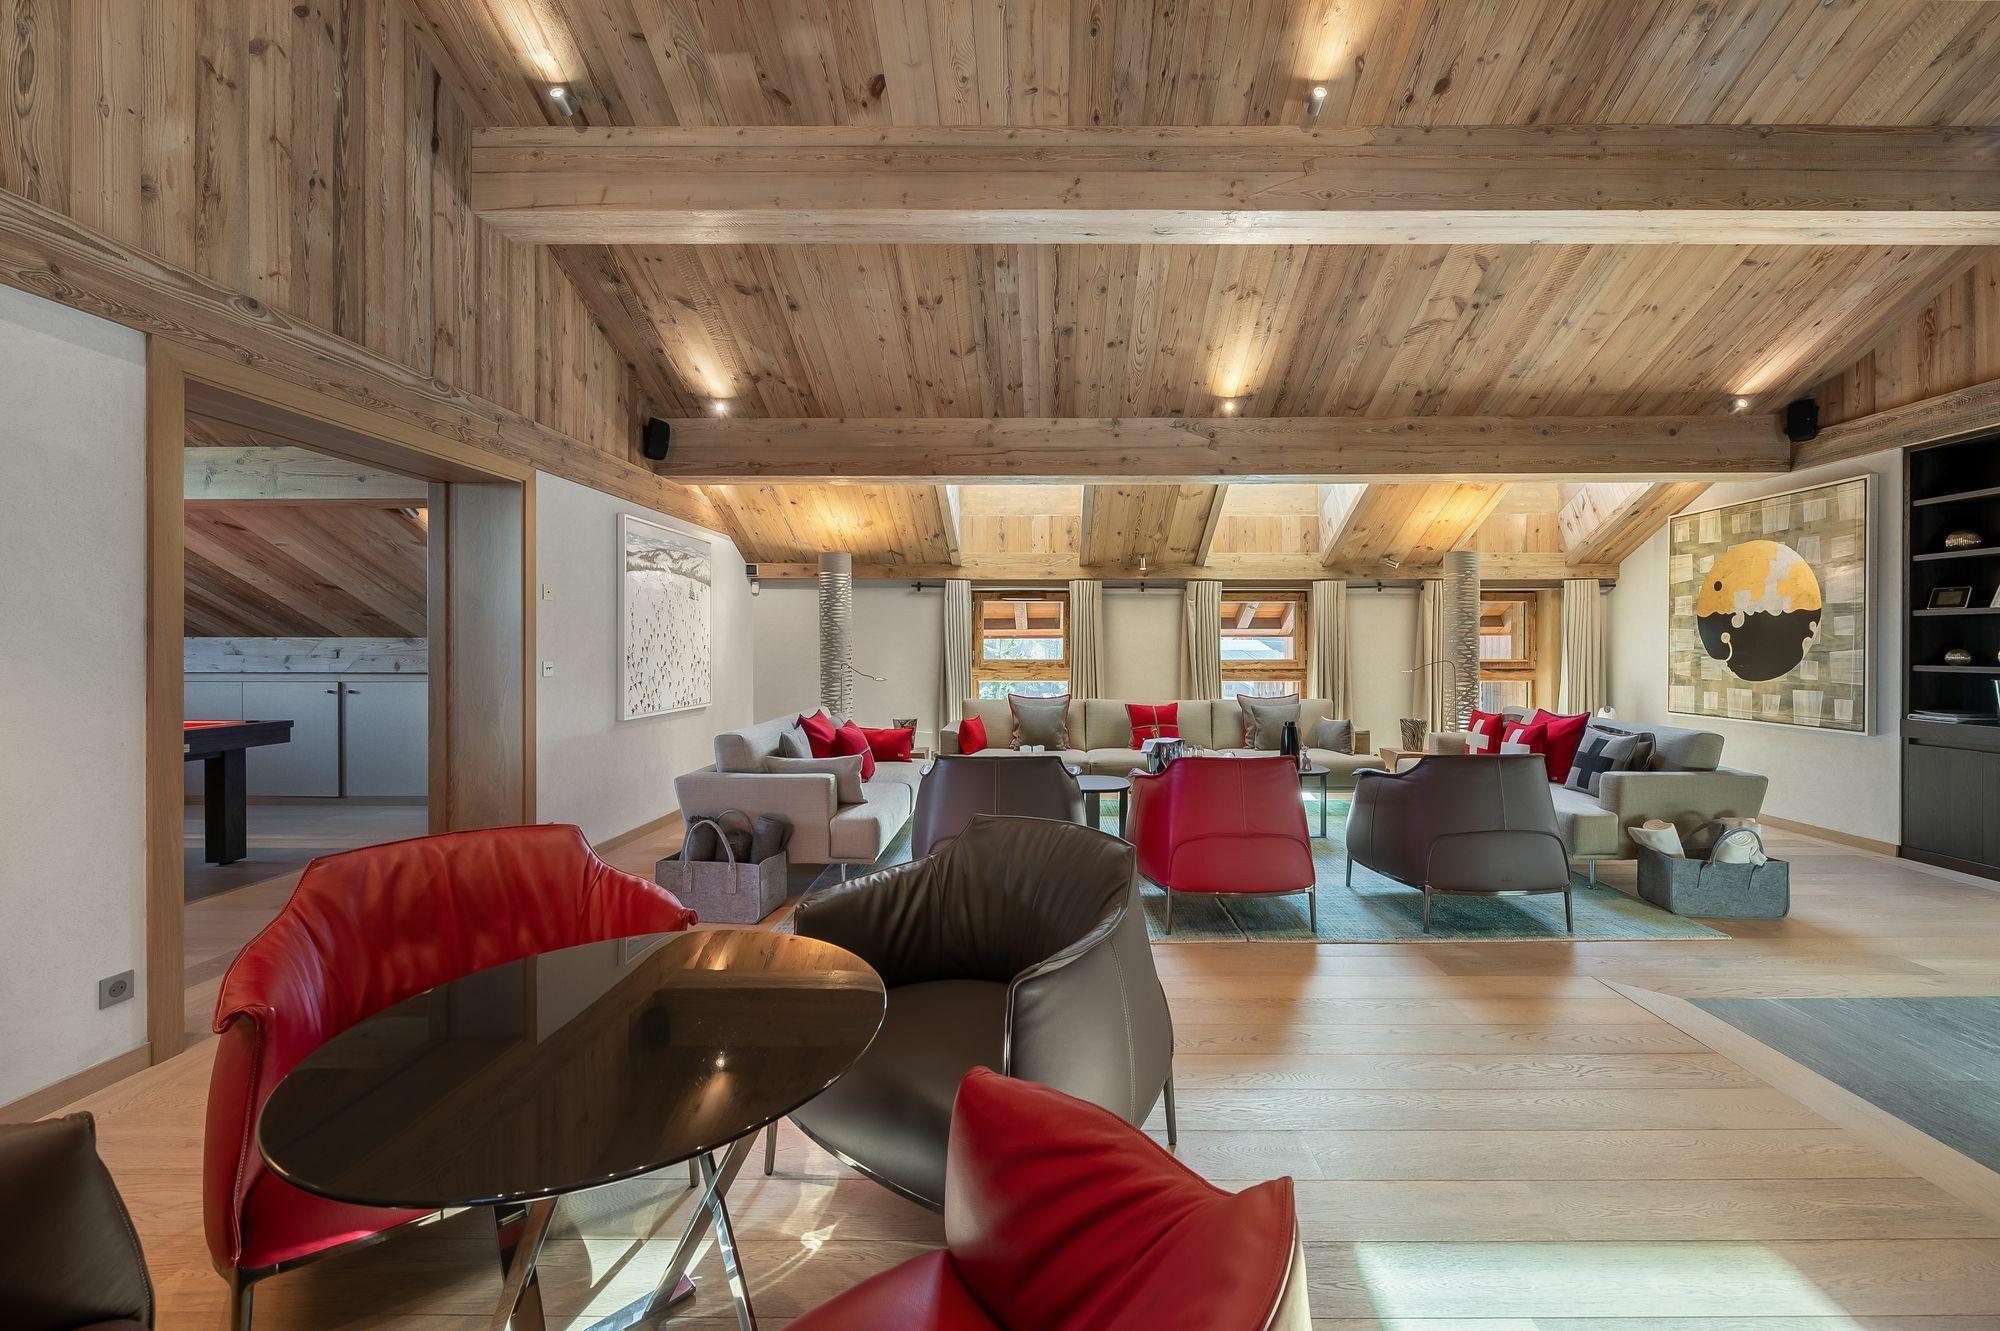 Meribel accommodation chalets for rent in Meribel apartments to rent in Meribel holiday homes to rent in Meribel